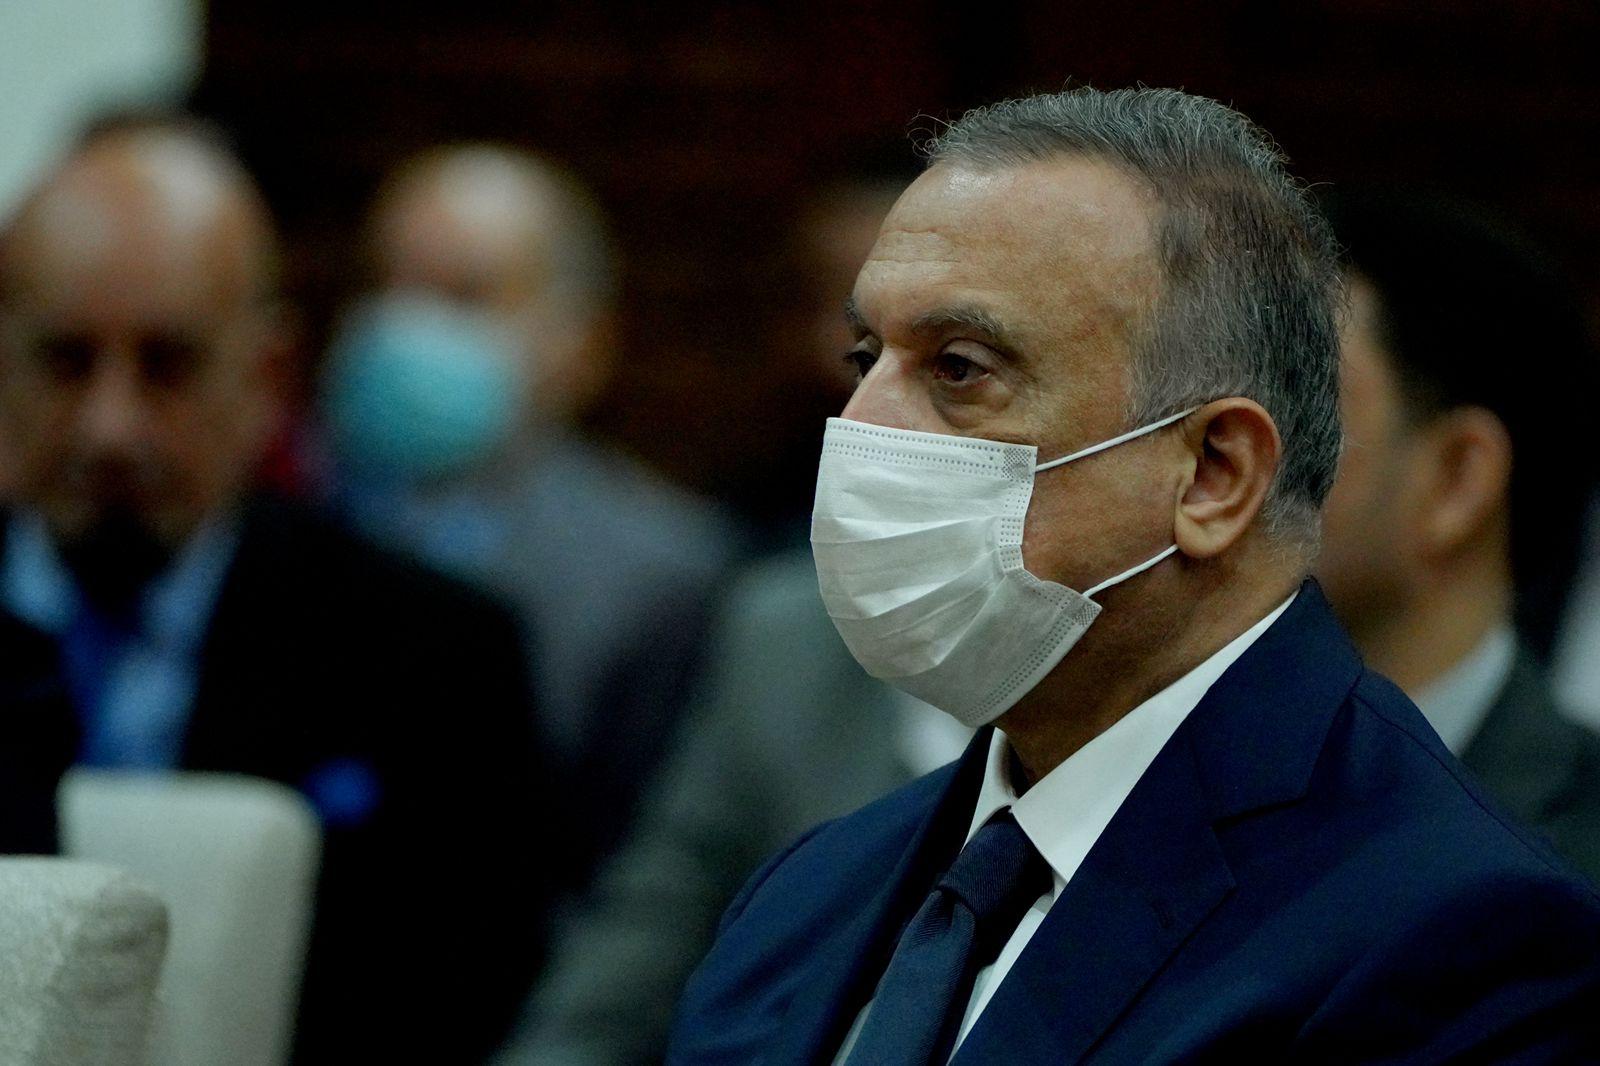 Billions of dollars were smuggled outside Iraq, PM al-Kadhimi reveals